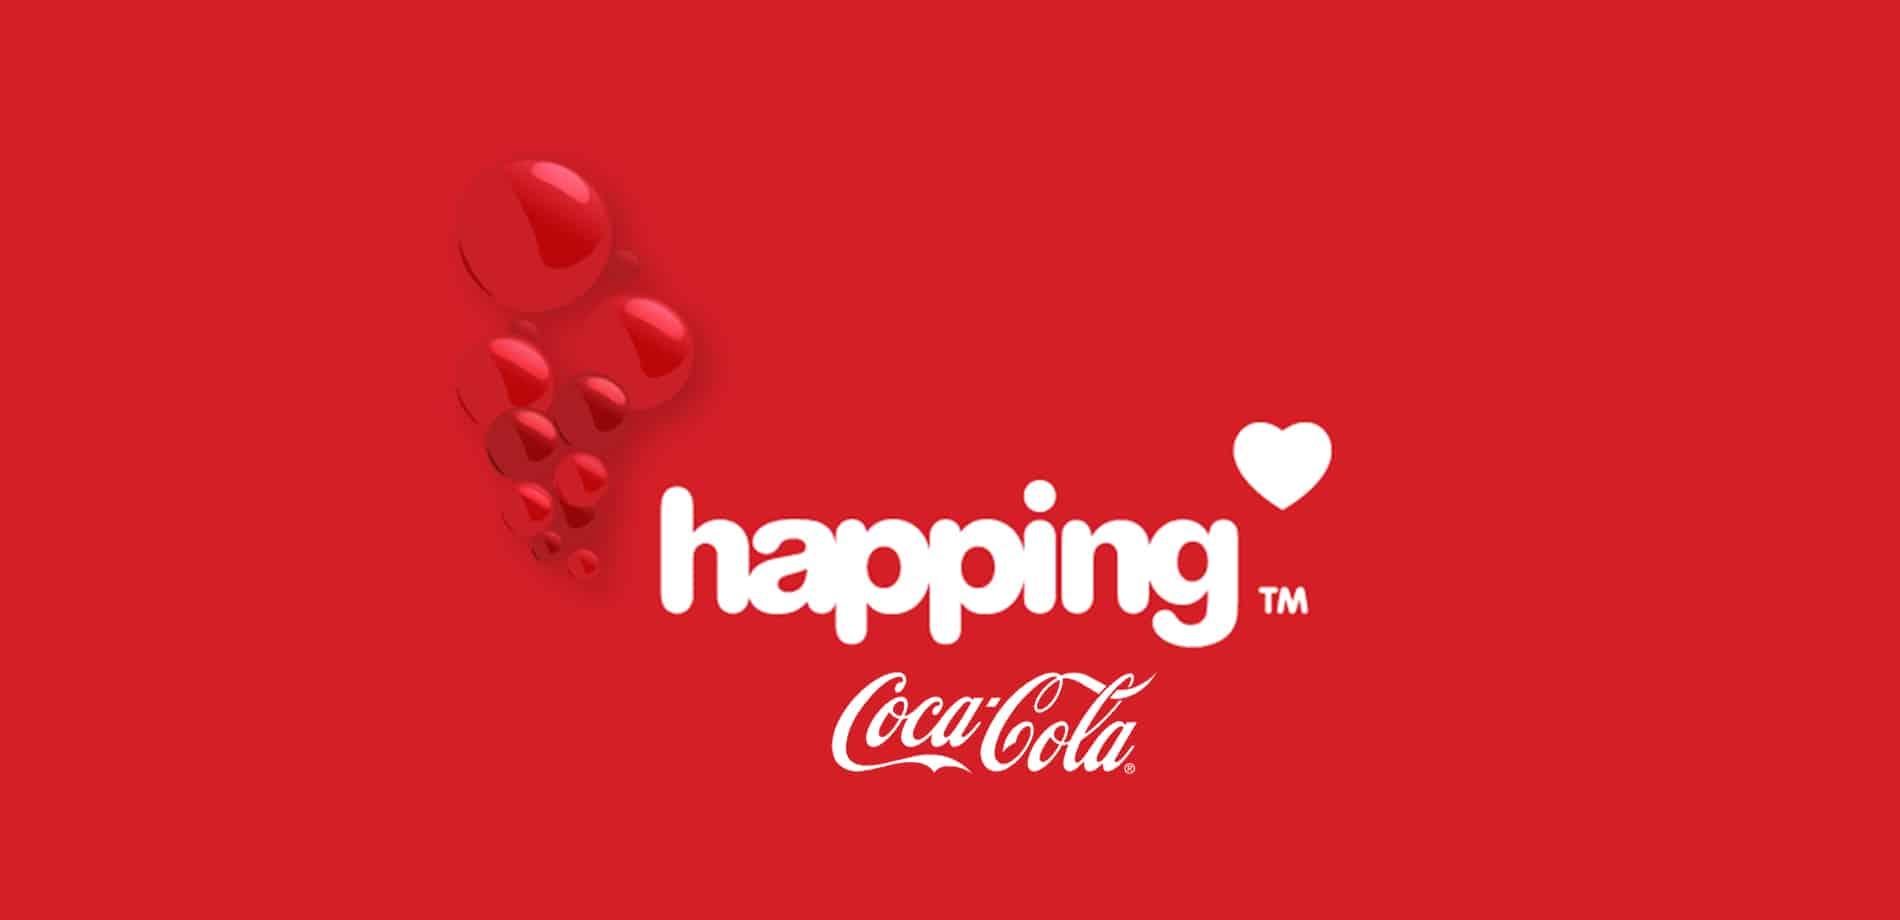 Coca-Cola Happing Map